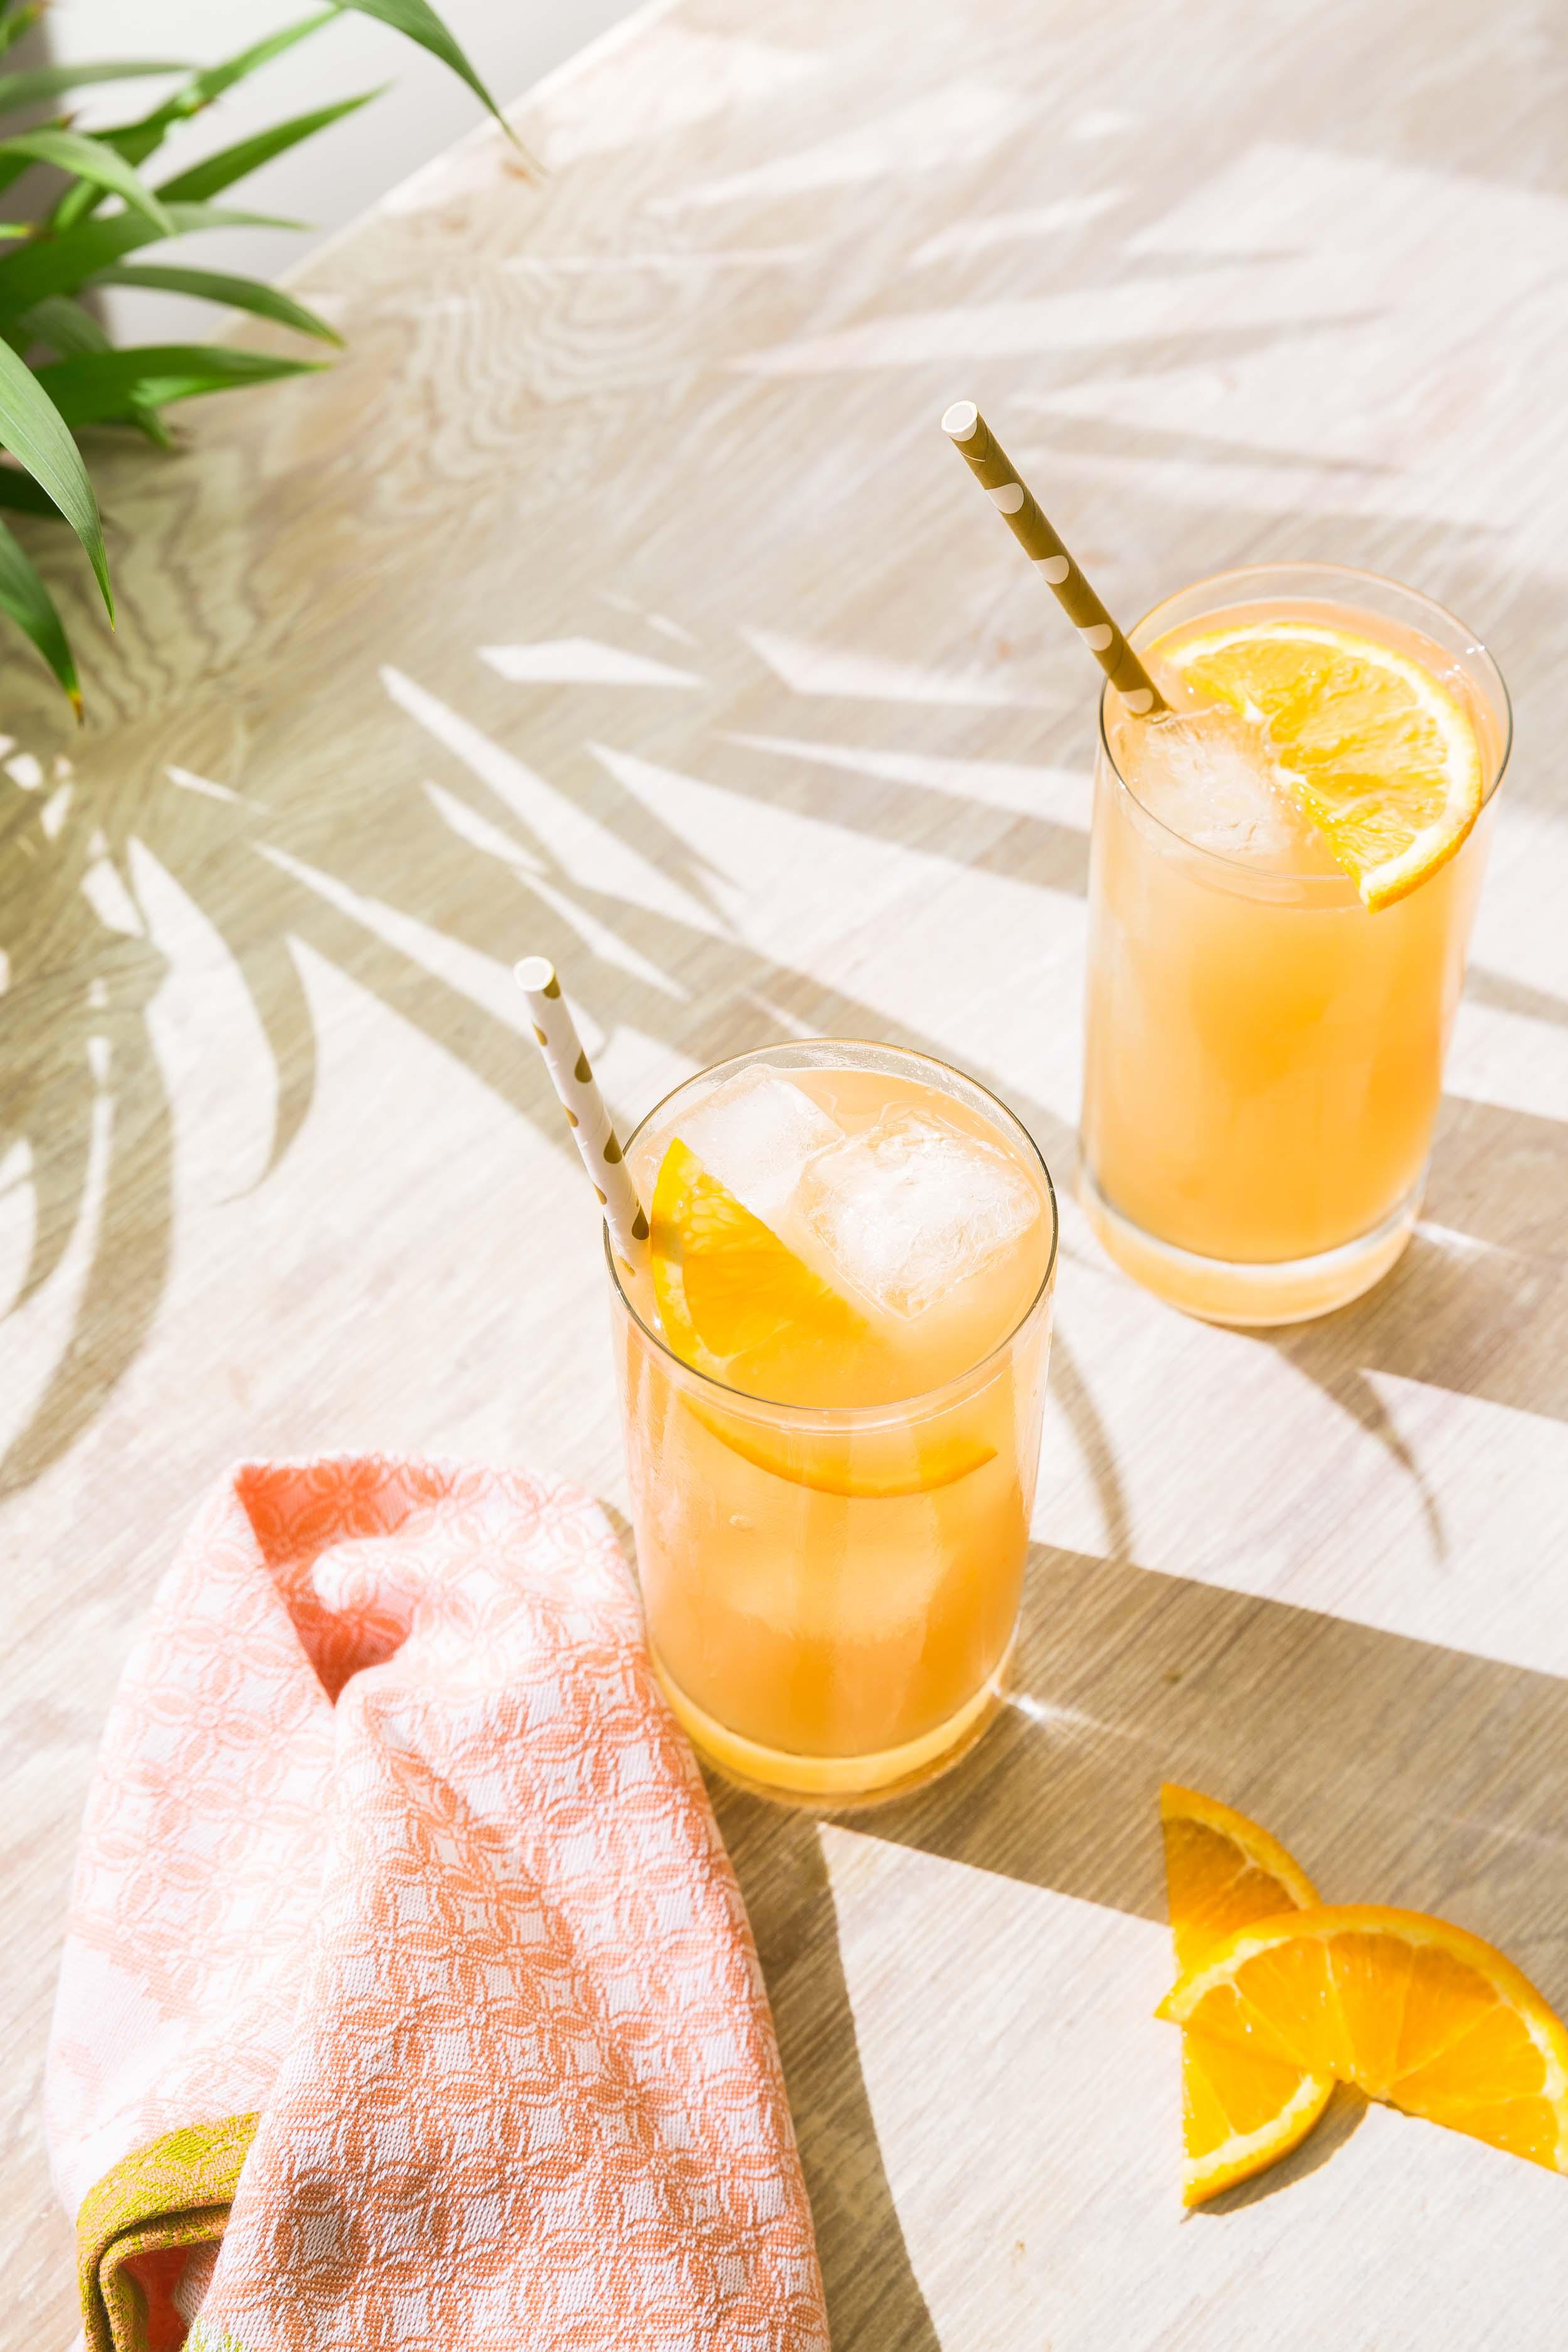 NatandCody-food-drink-01.jpg